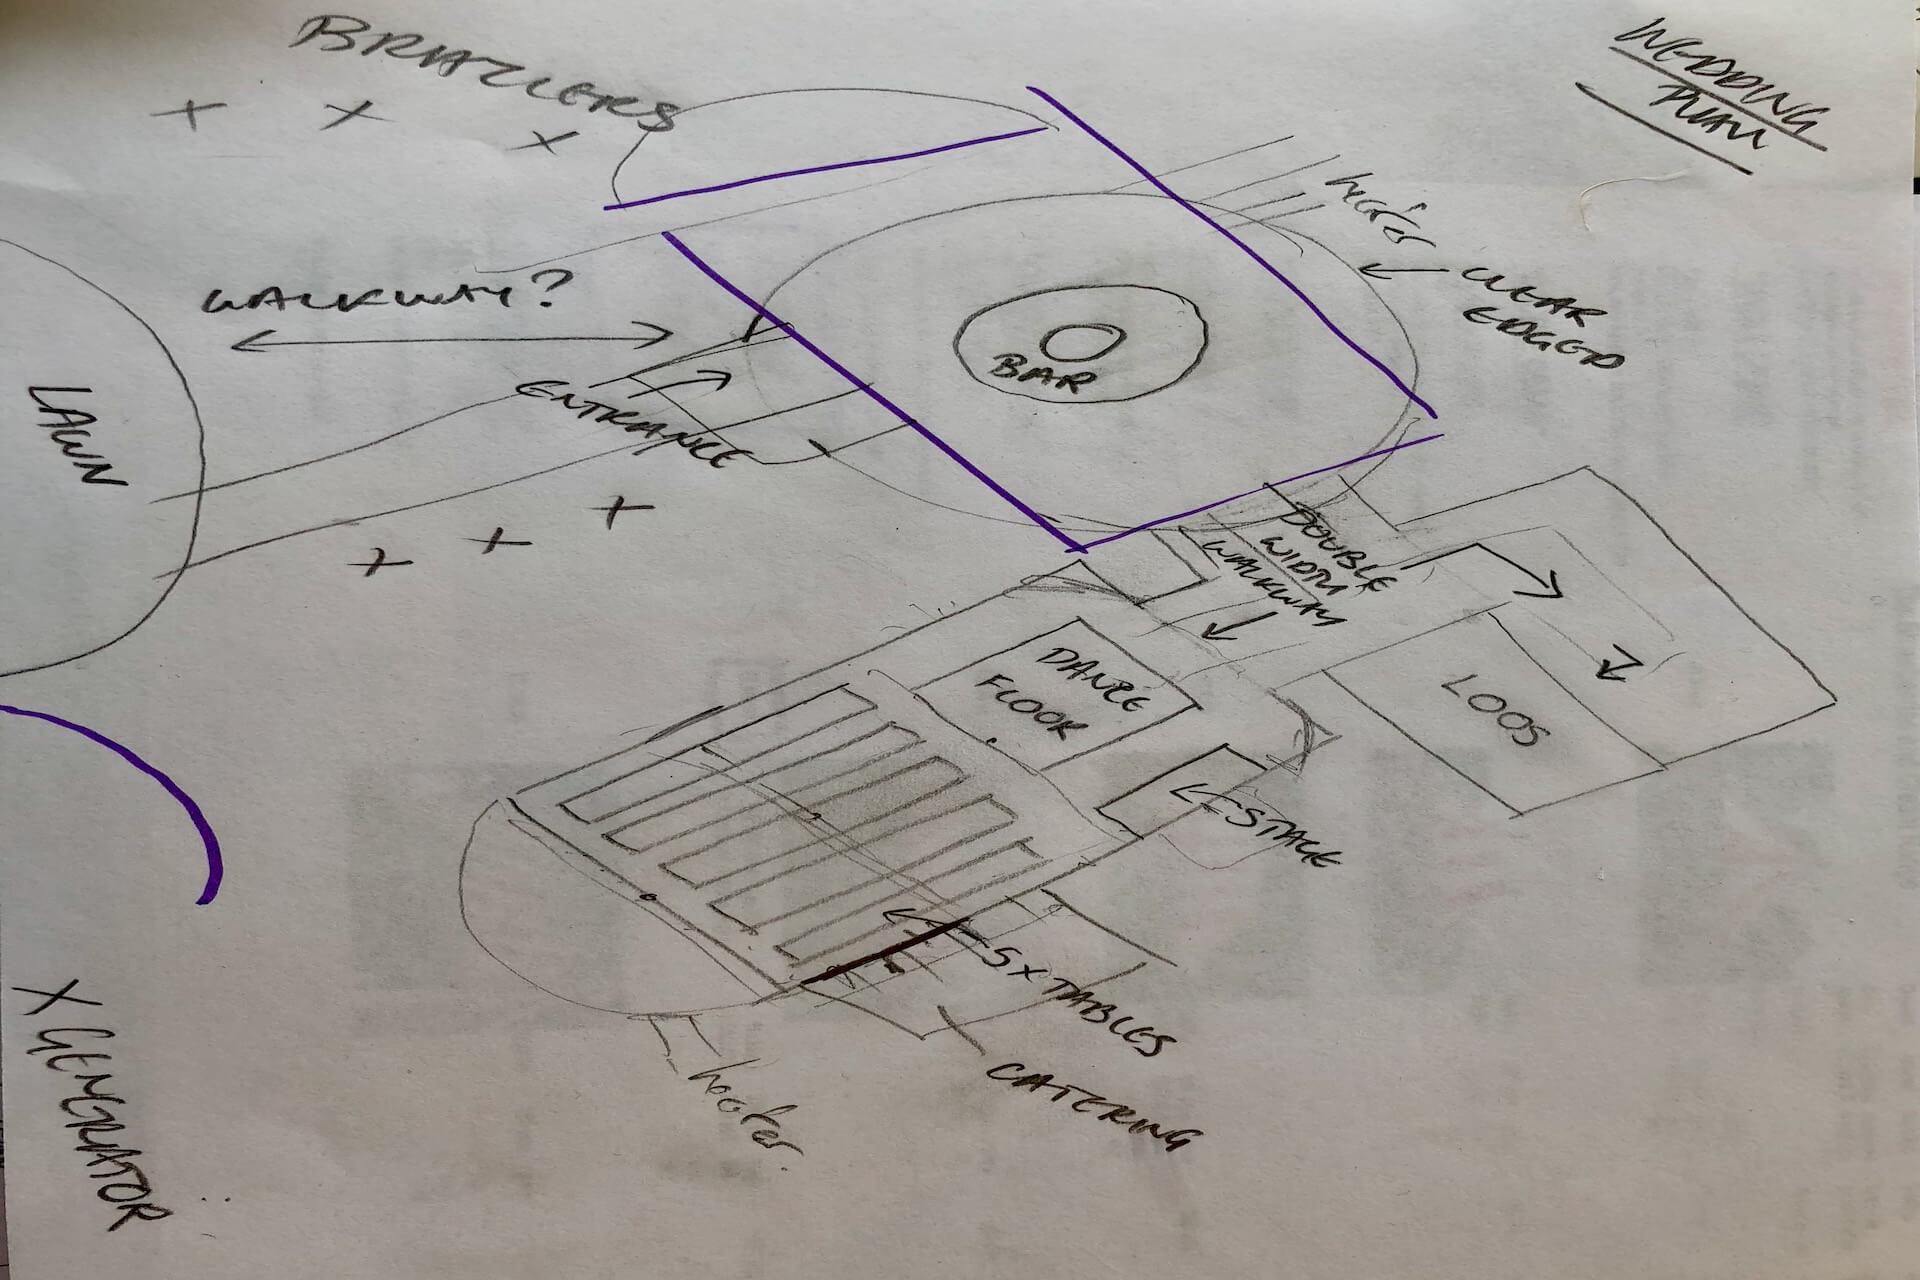 A wedding plan sketch idea on back of envelope.